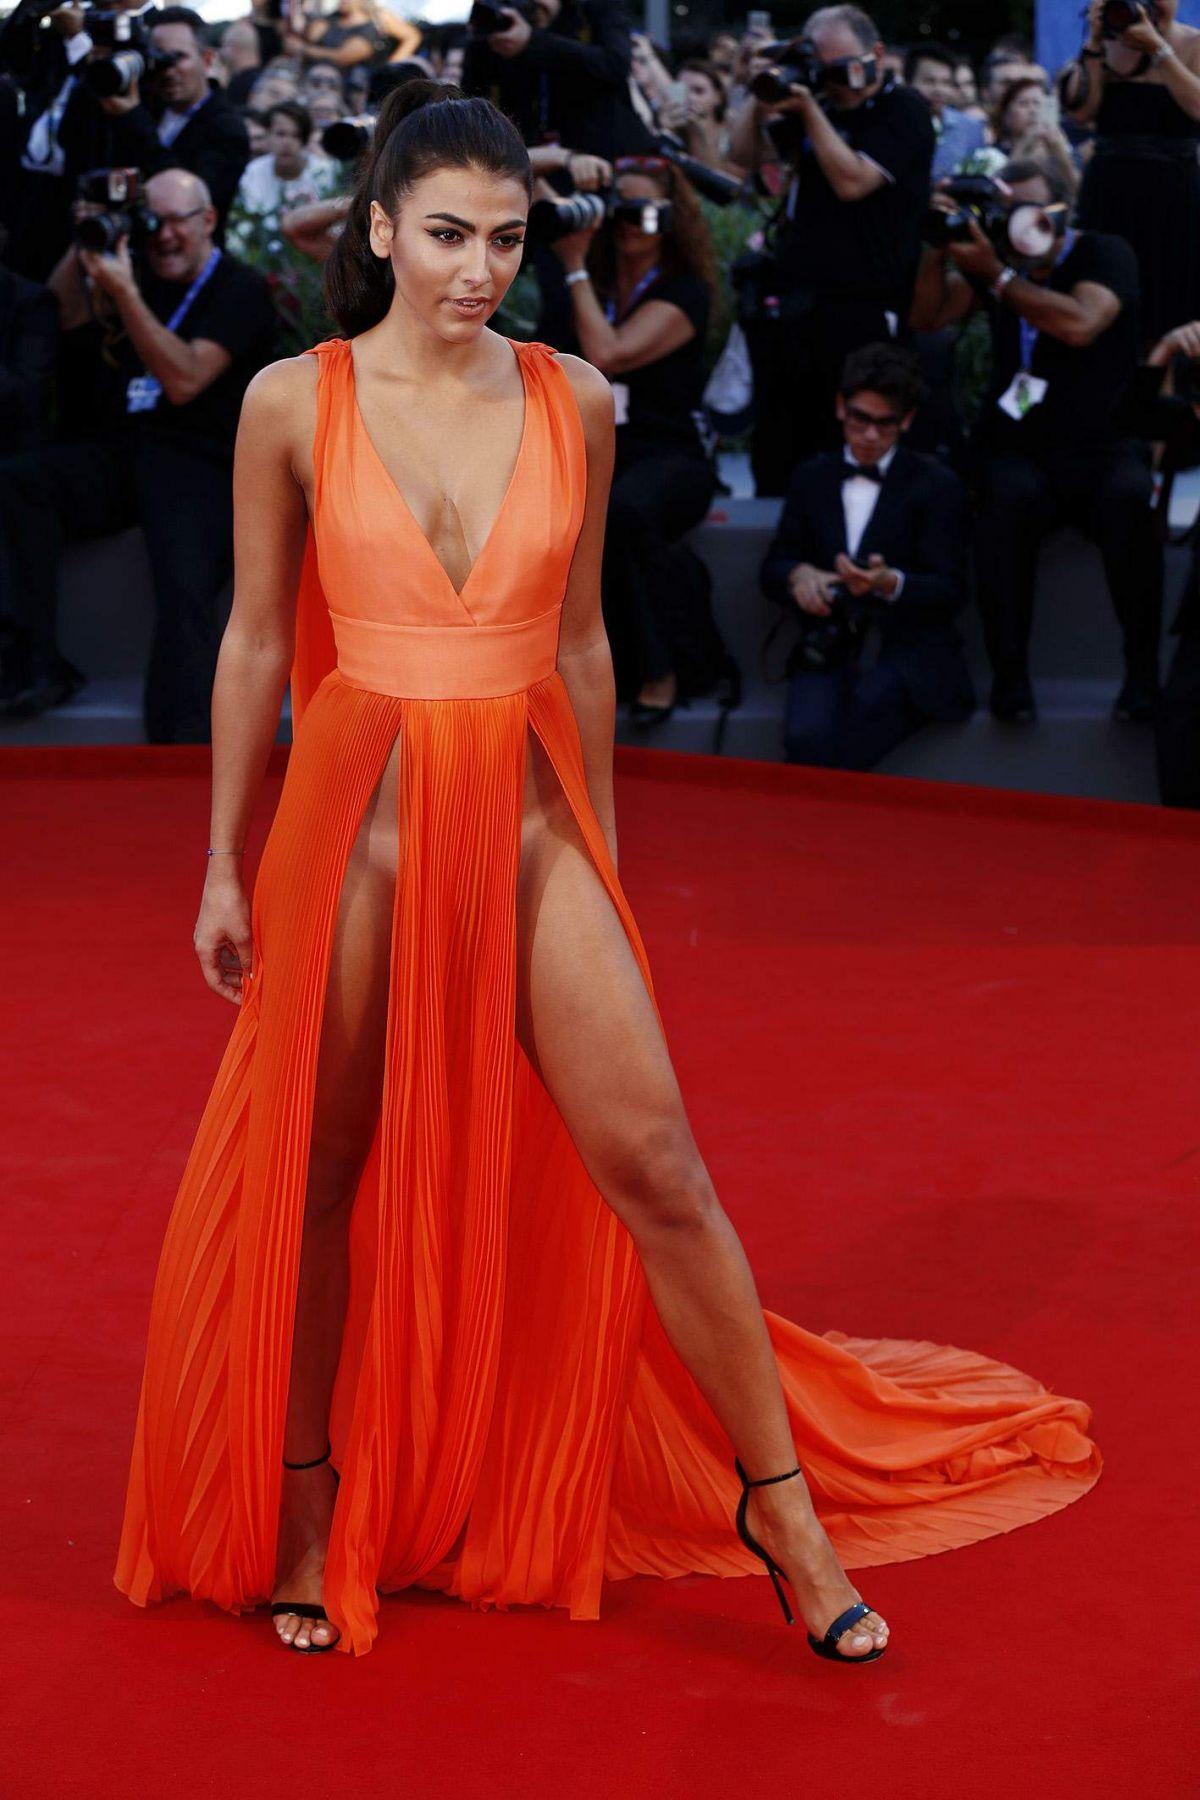 Fotos Giulia Salemi naked (55 photos), Ass, Bikini, Instagram, butt 2020